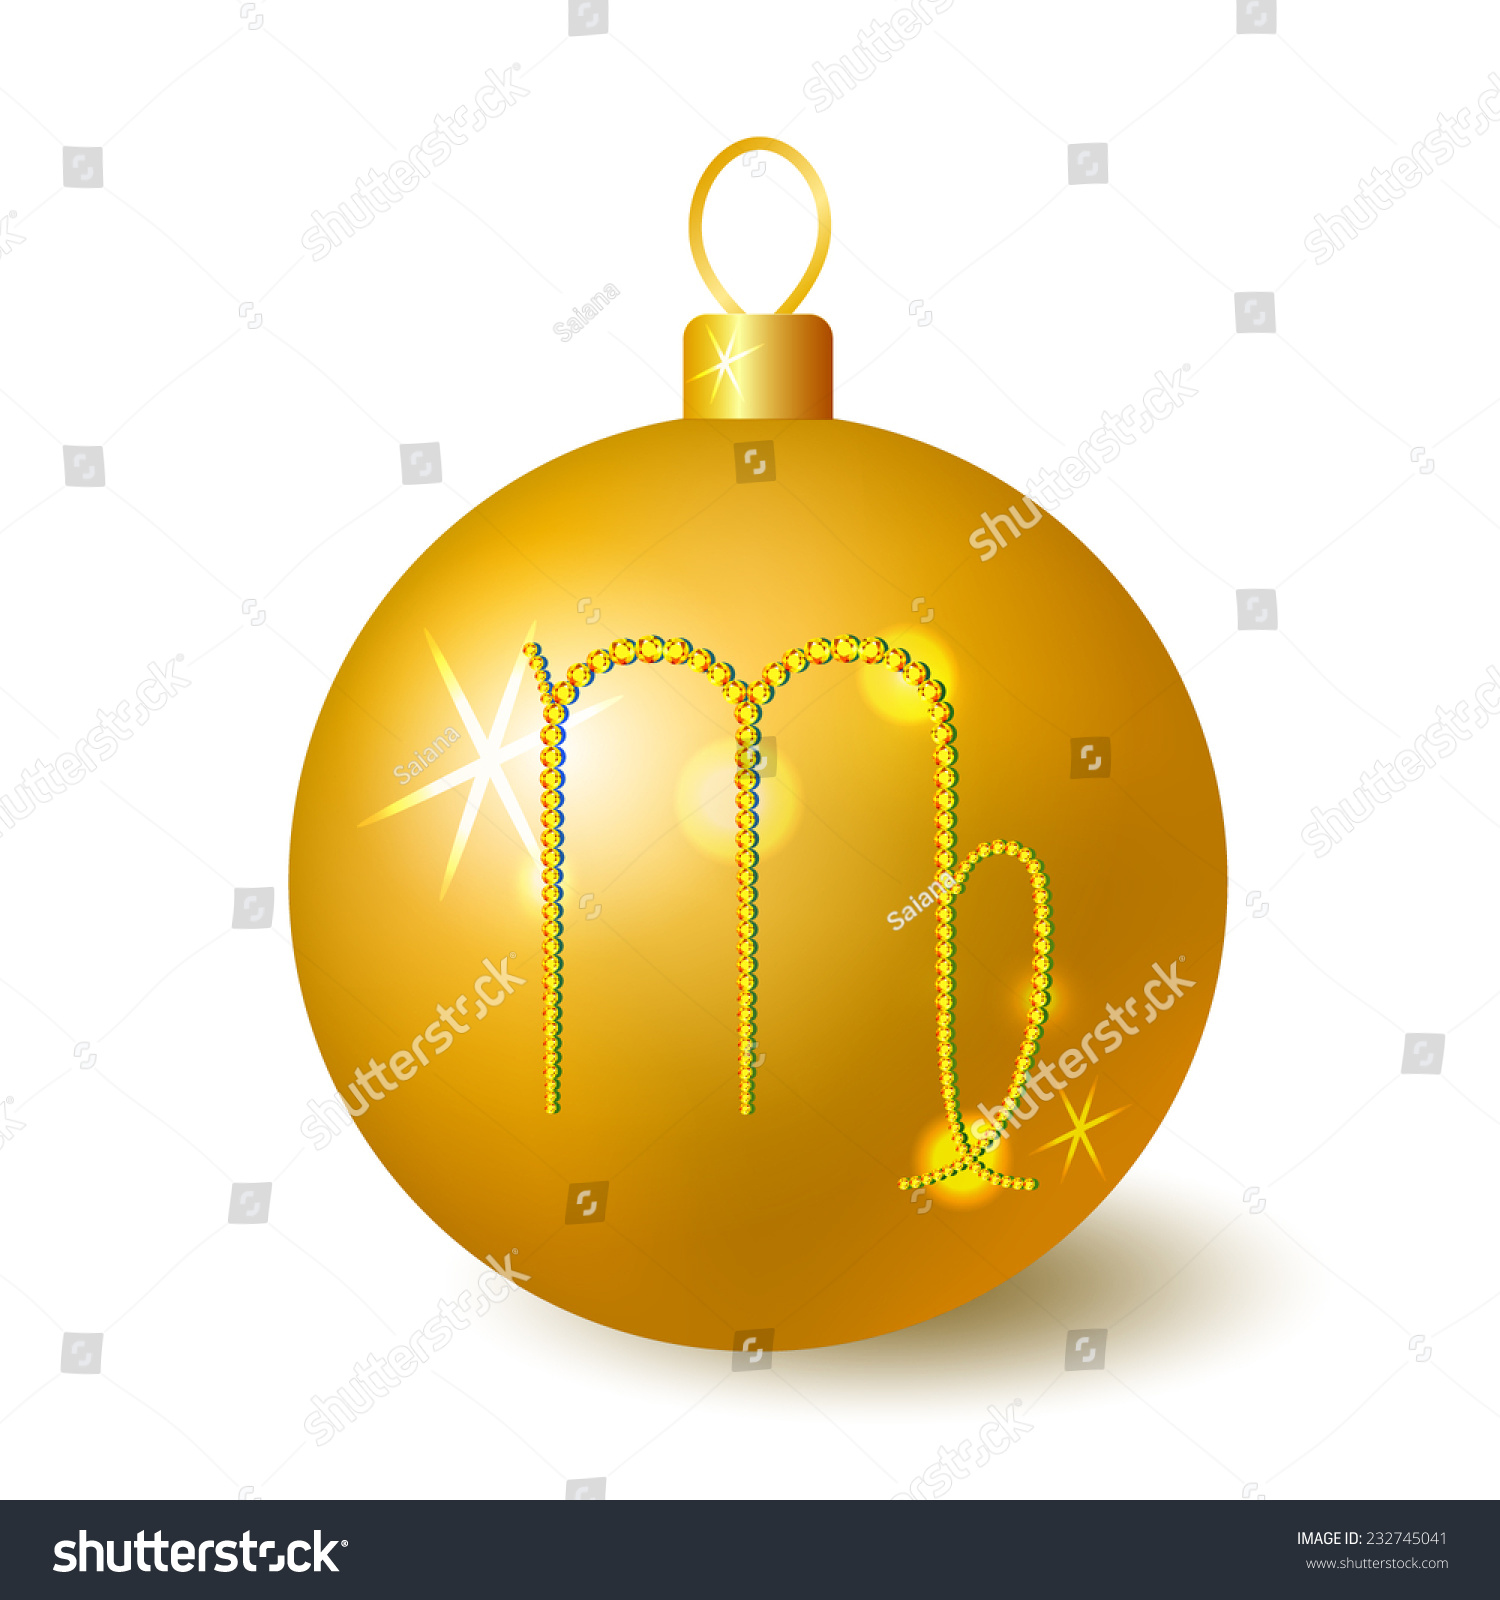 Golden christmas ball zodiac symbol virgo stock vector 232745041 golden christmas ball with zodiac symbol virgo made of crystals buycottarizona Gallery